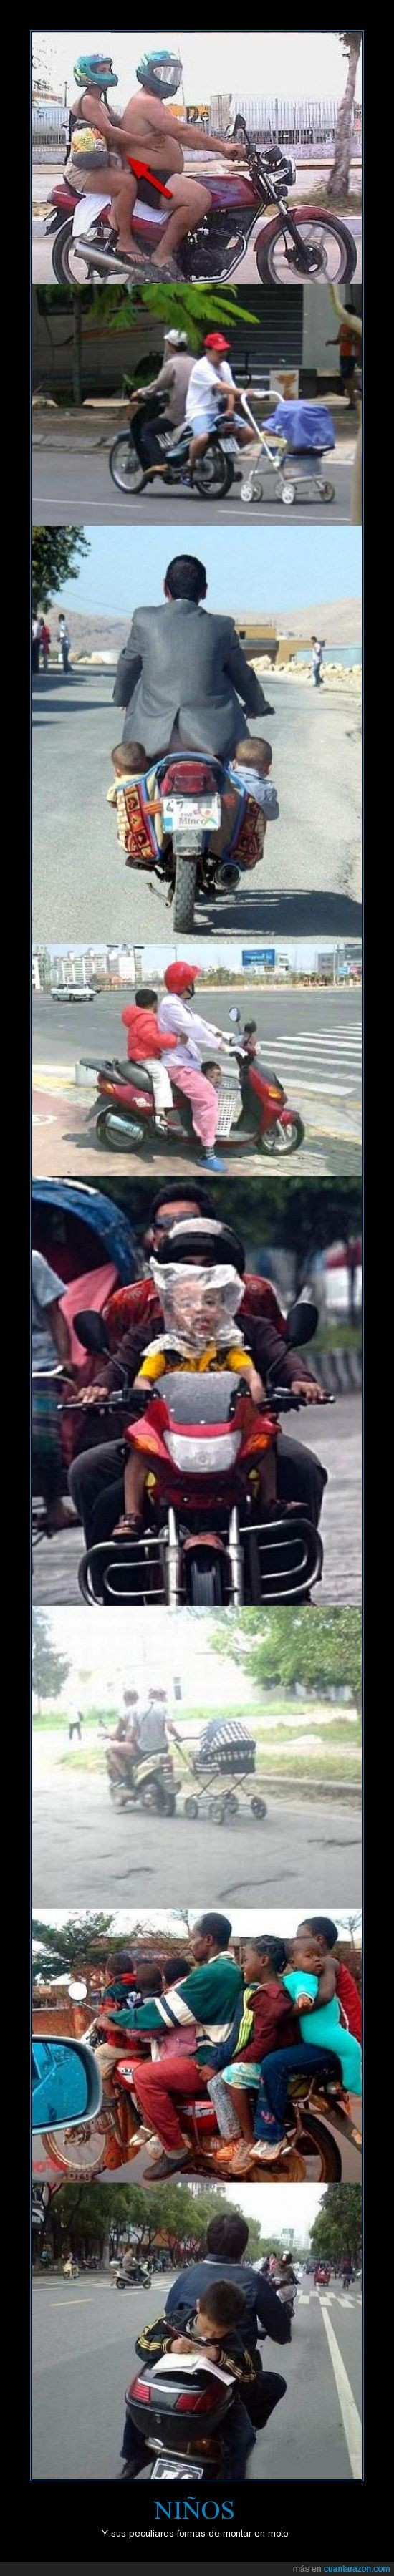 casco,moto,motocicleta,Niños,padre,proteger,seguridad